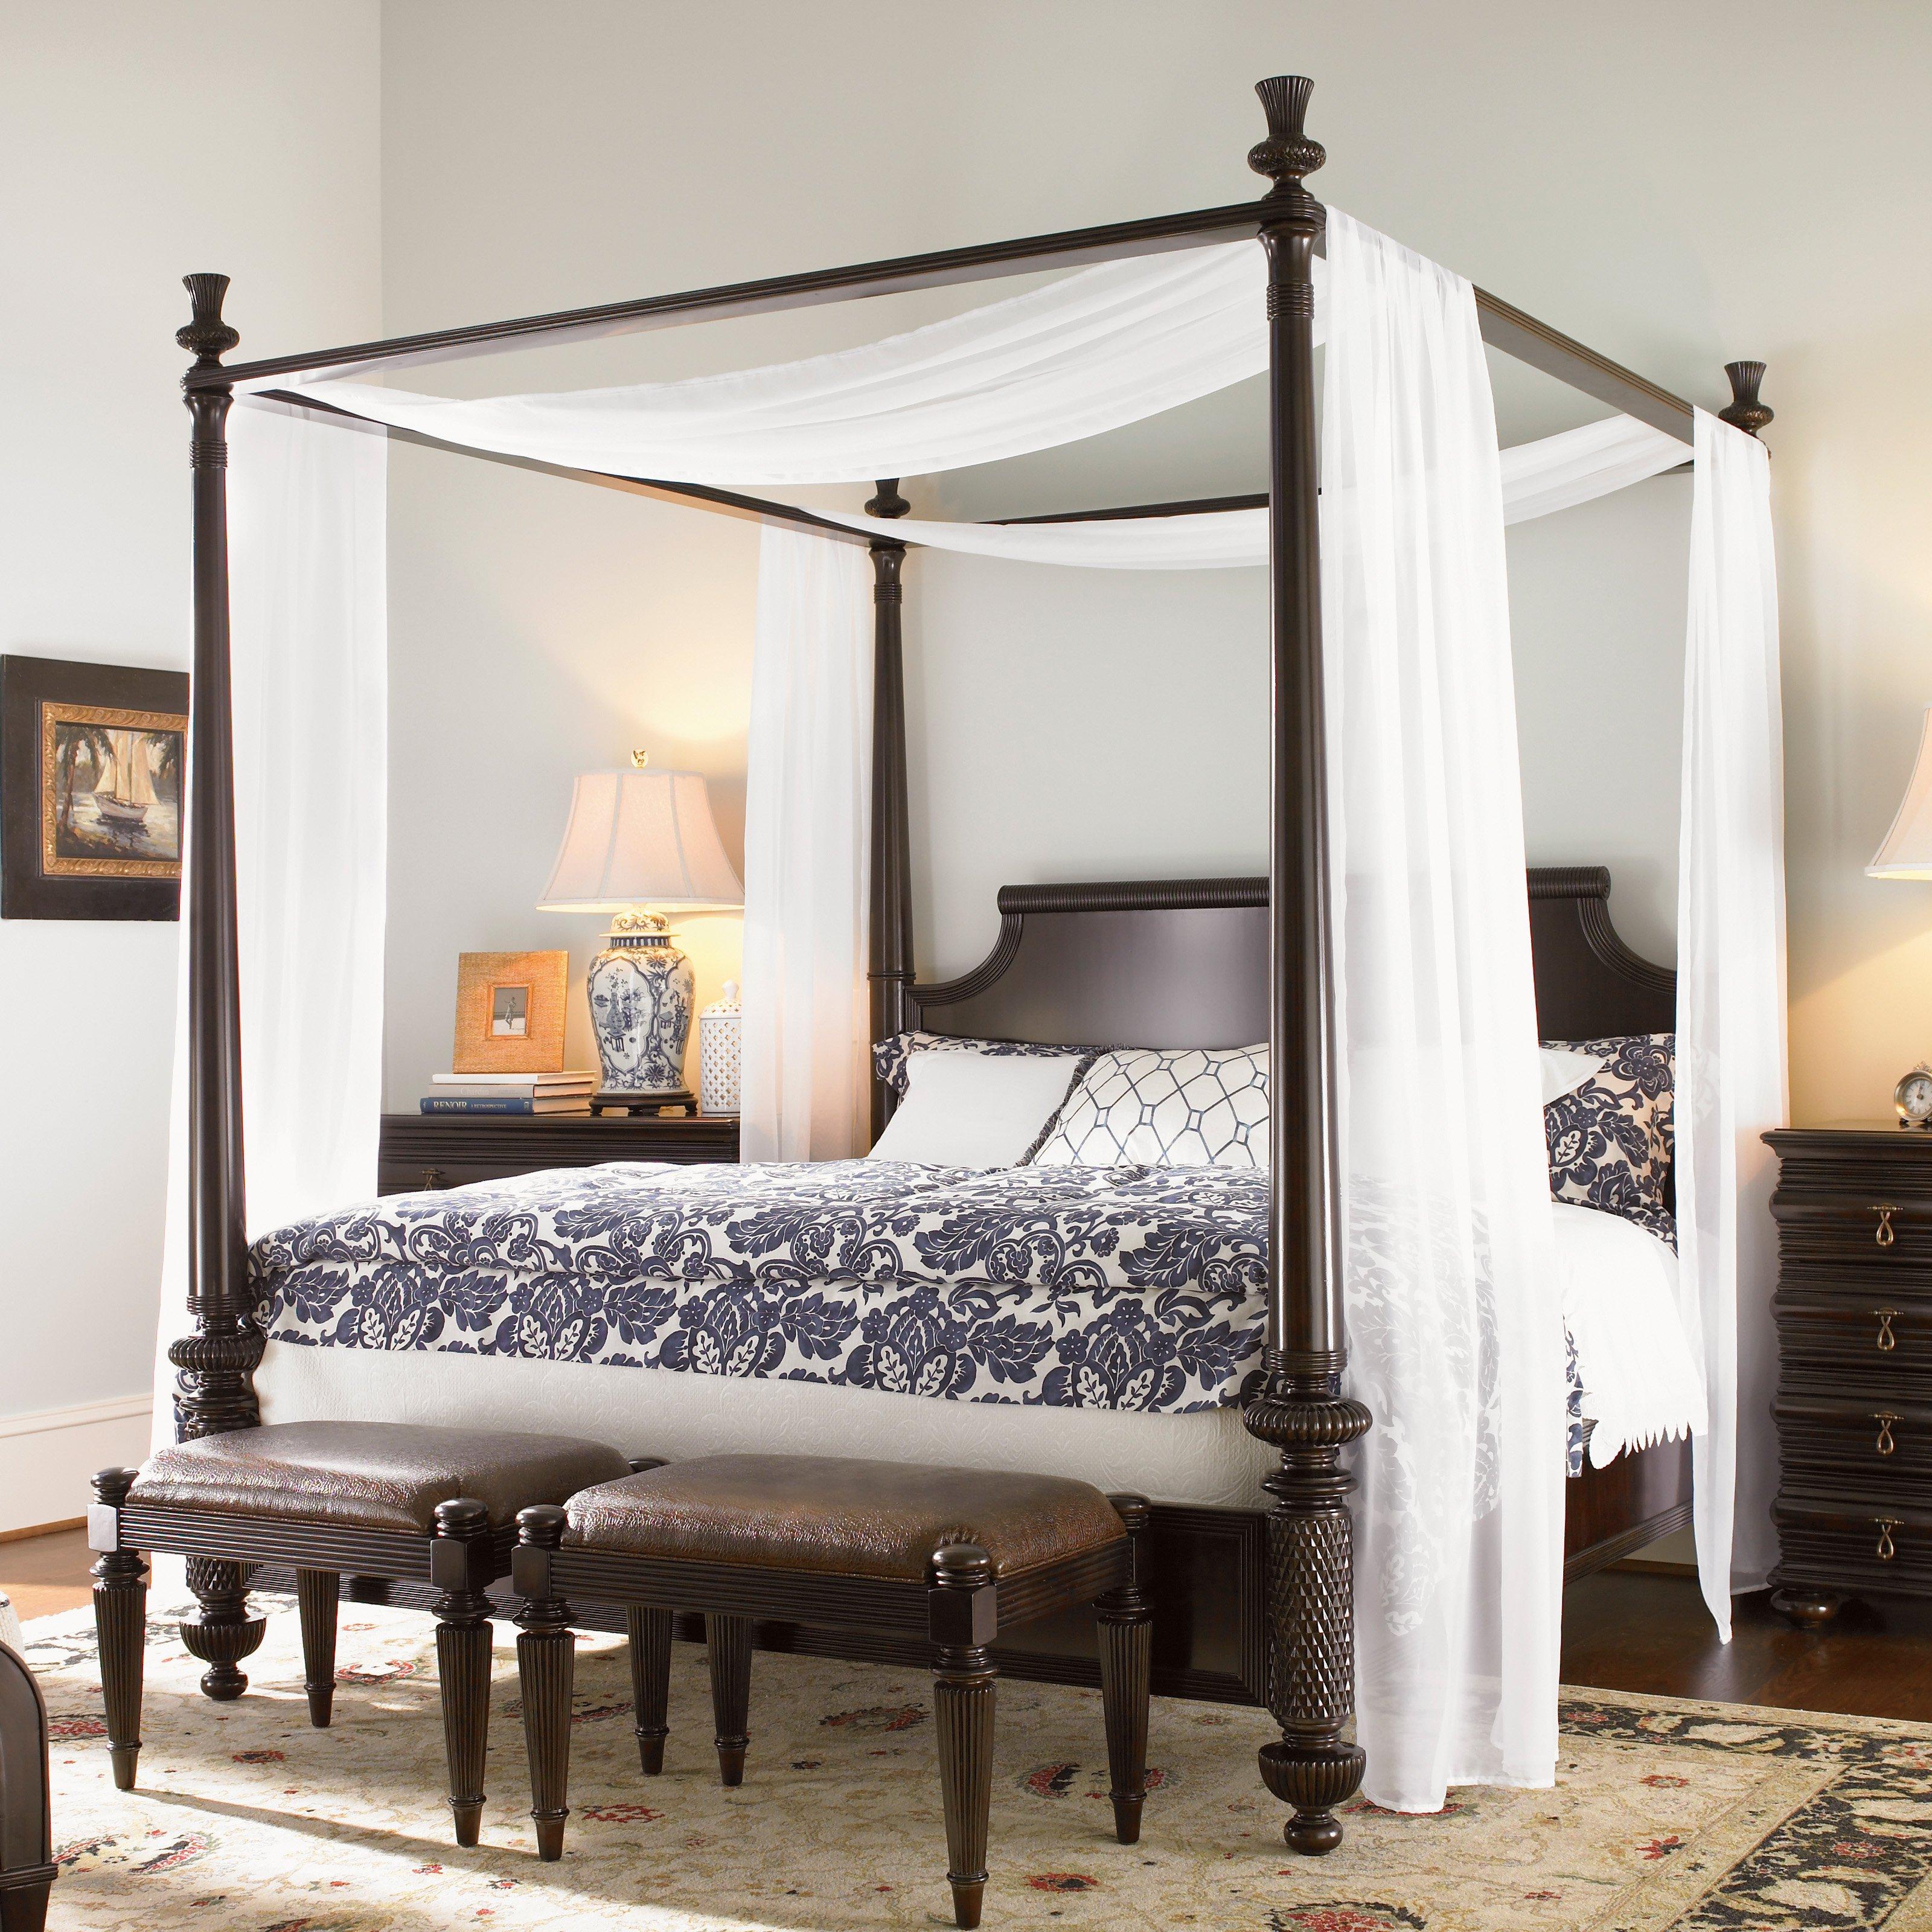 tommy bahama royal kahala diamond head canopy bed - beds at hayneedle UCSYTLK